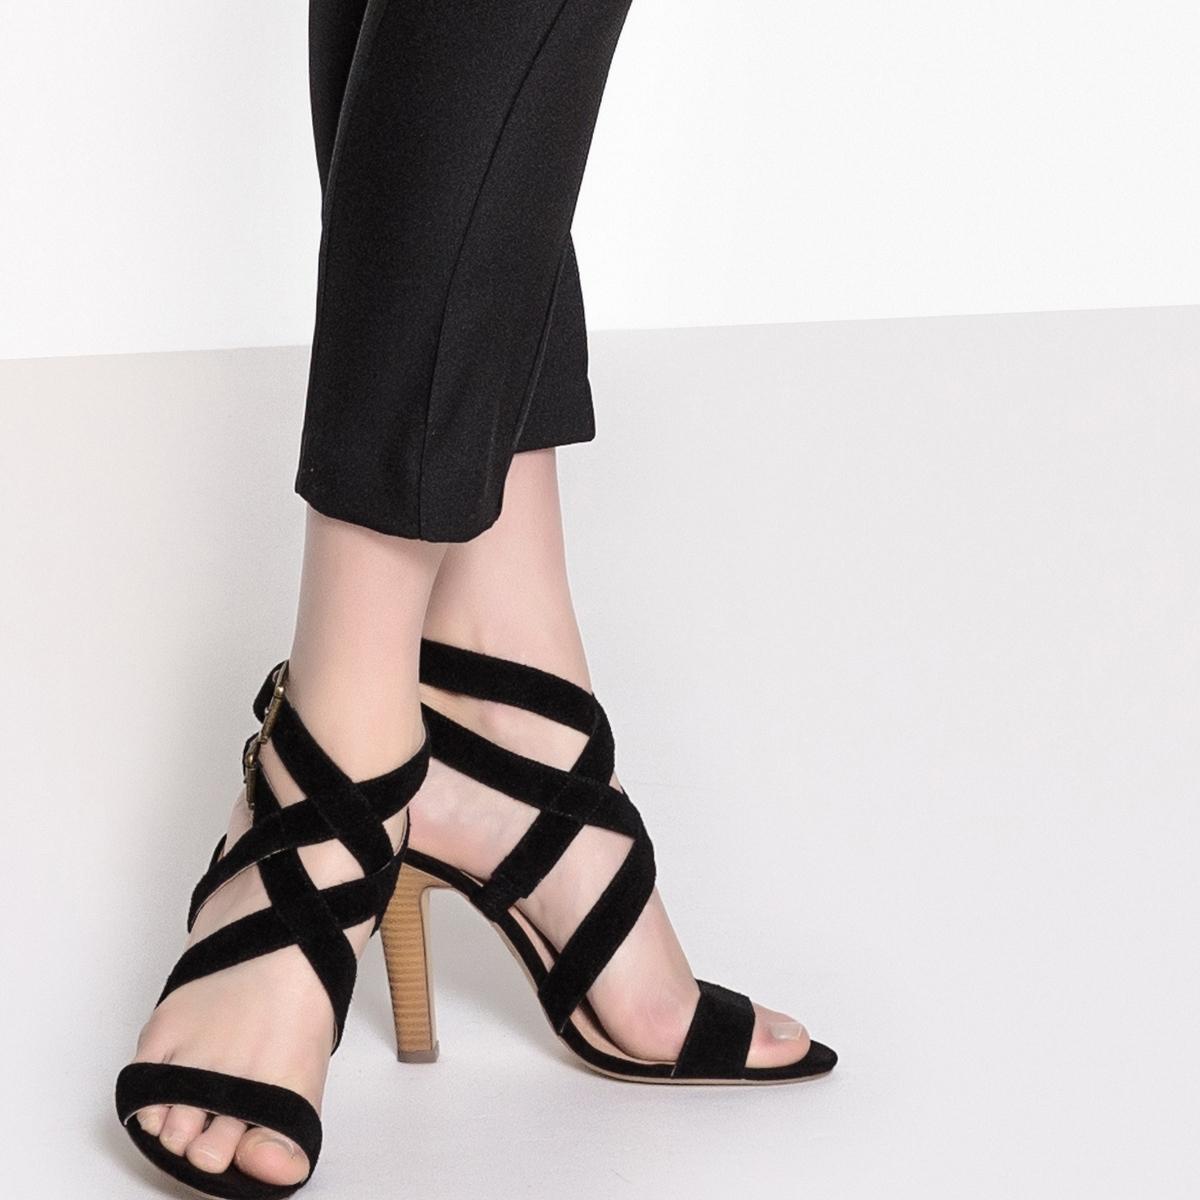 Sandalias de piel con doble correa